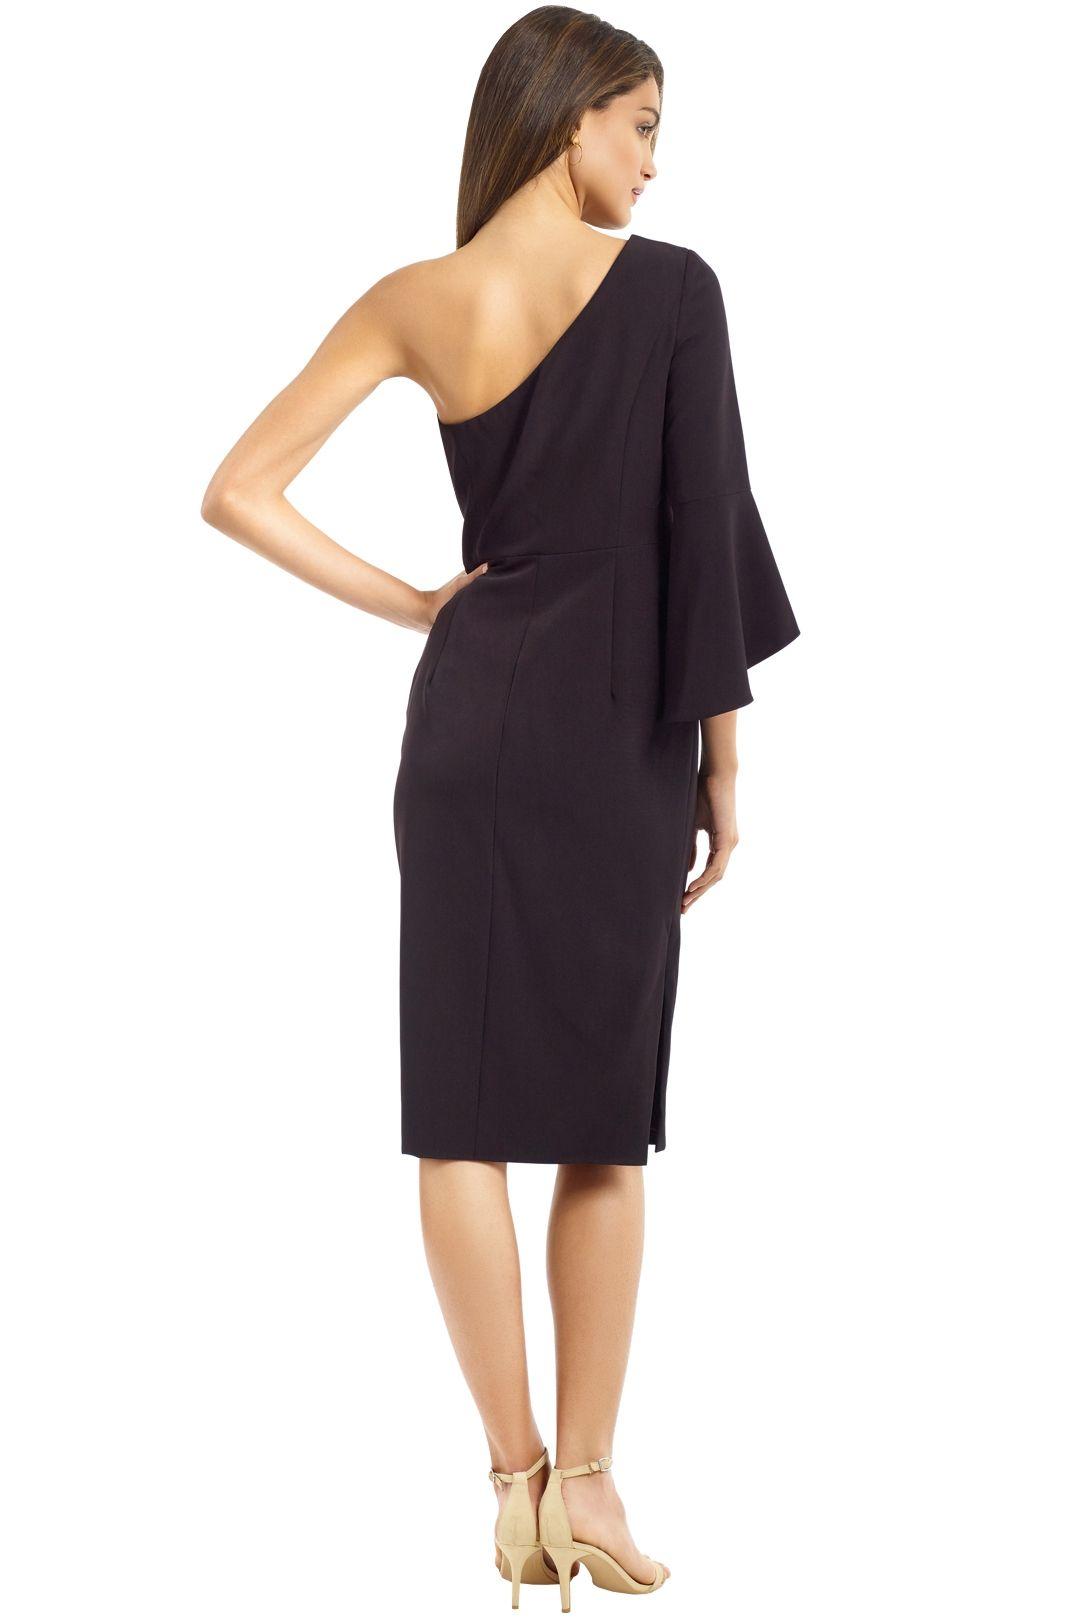 Milly - Sadrine Dress - Black - Back